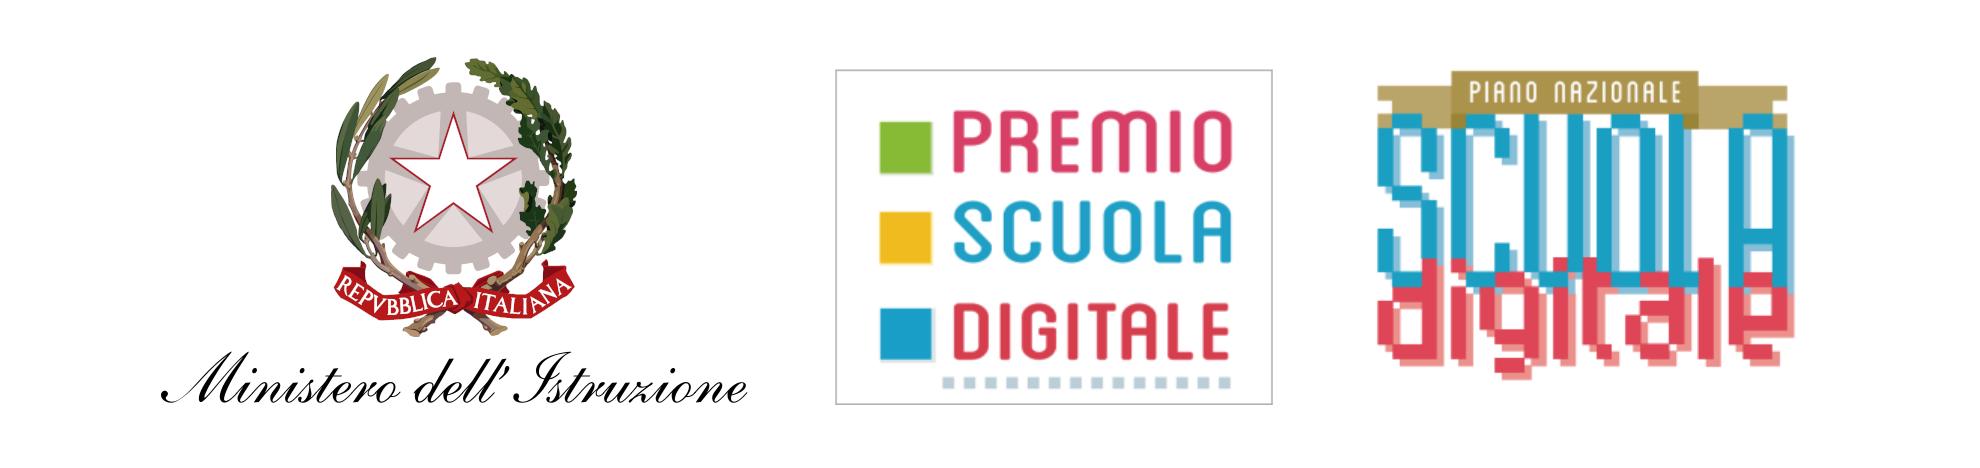 Logo MIUR, PSD, Scuola Digitale